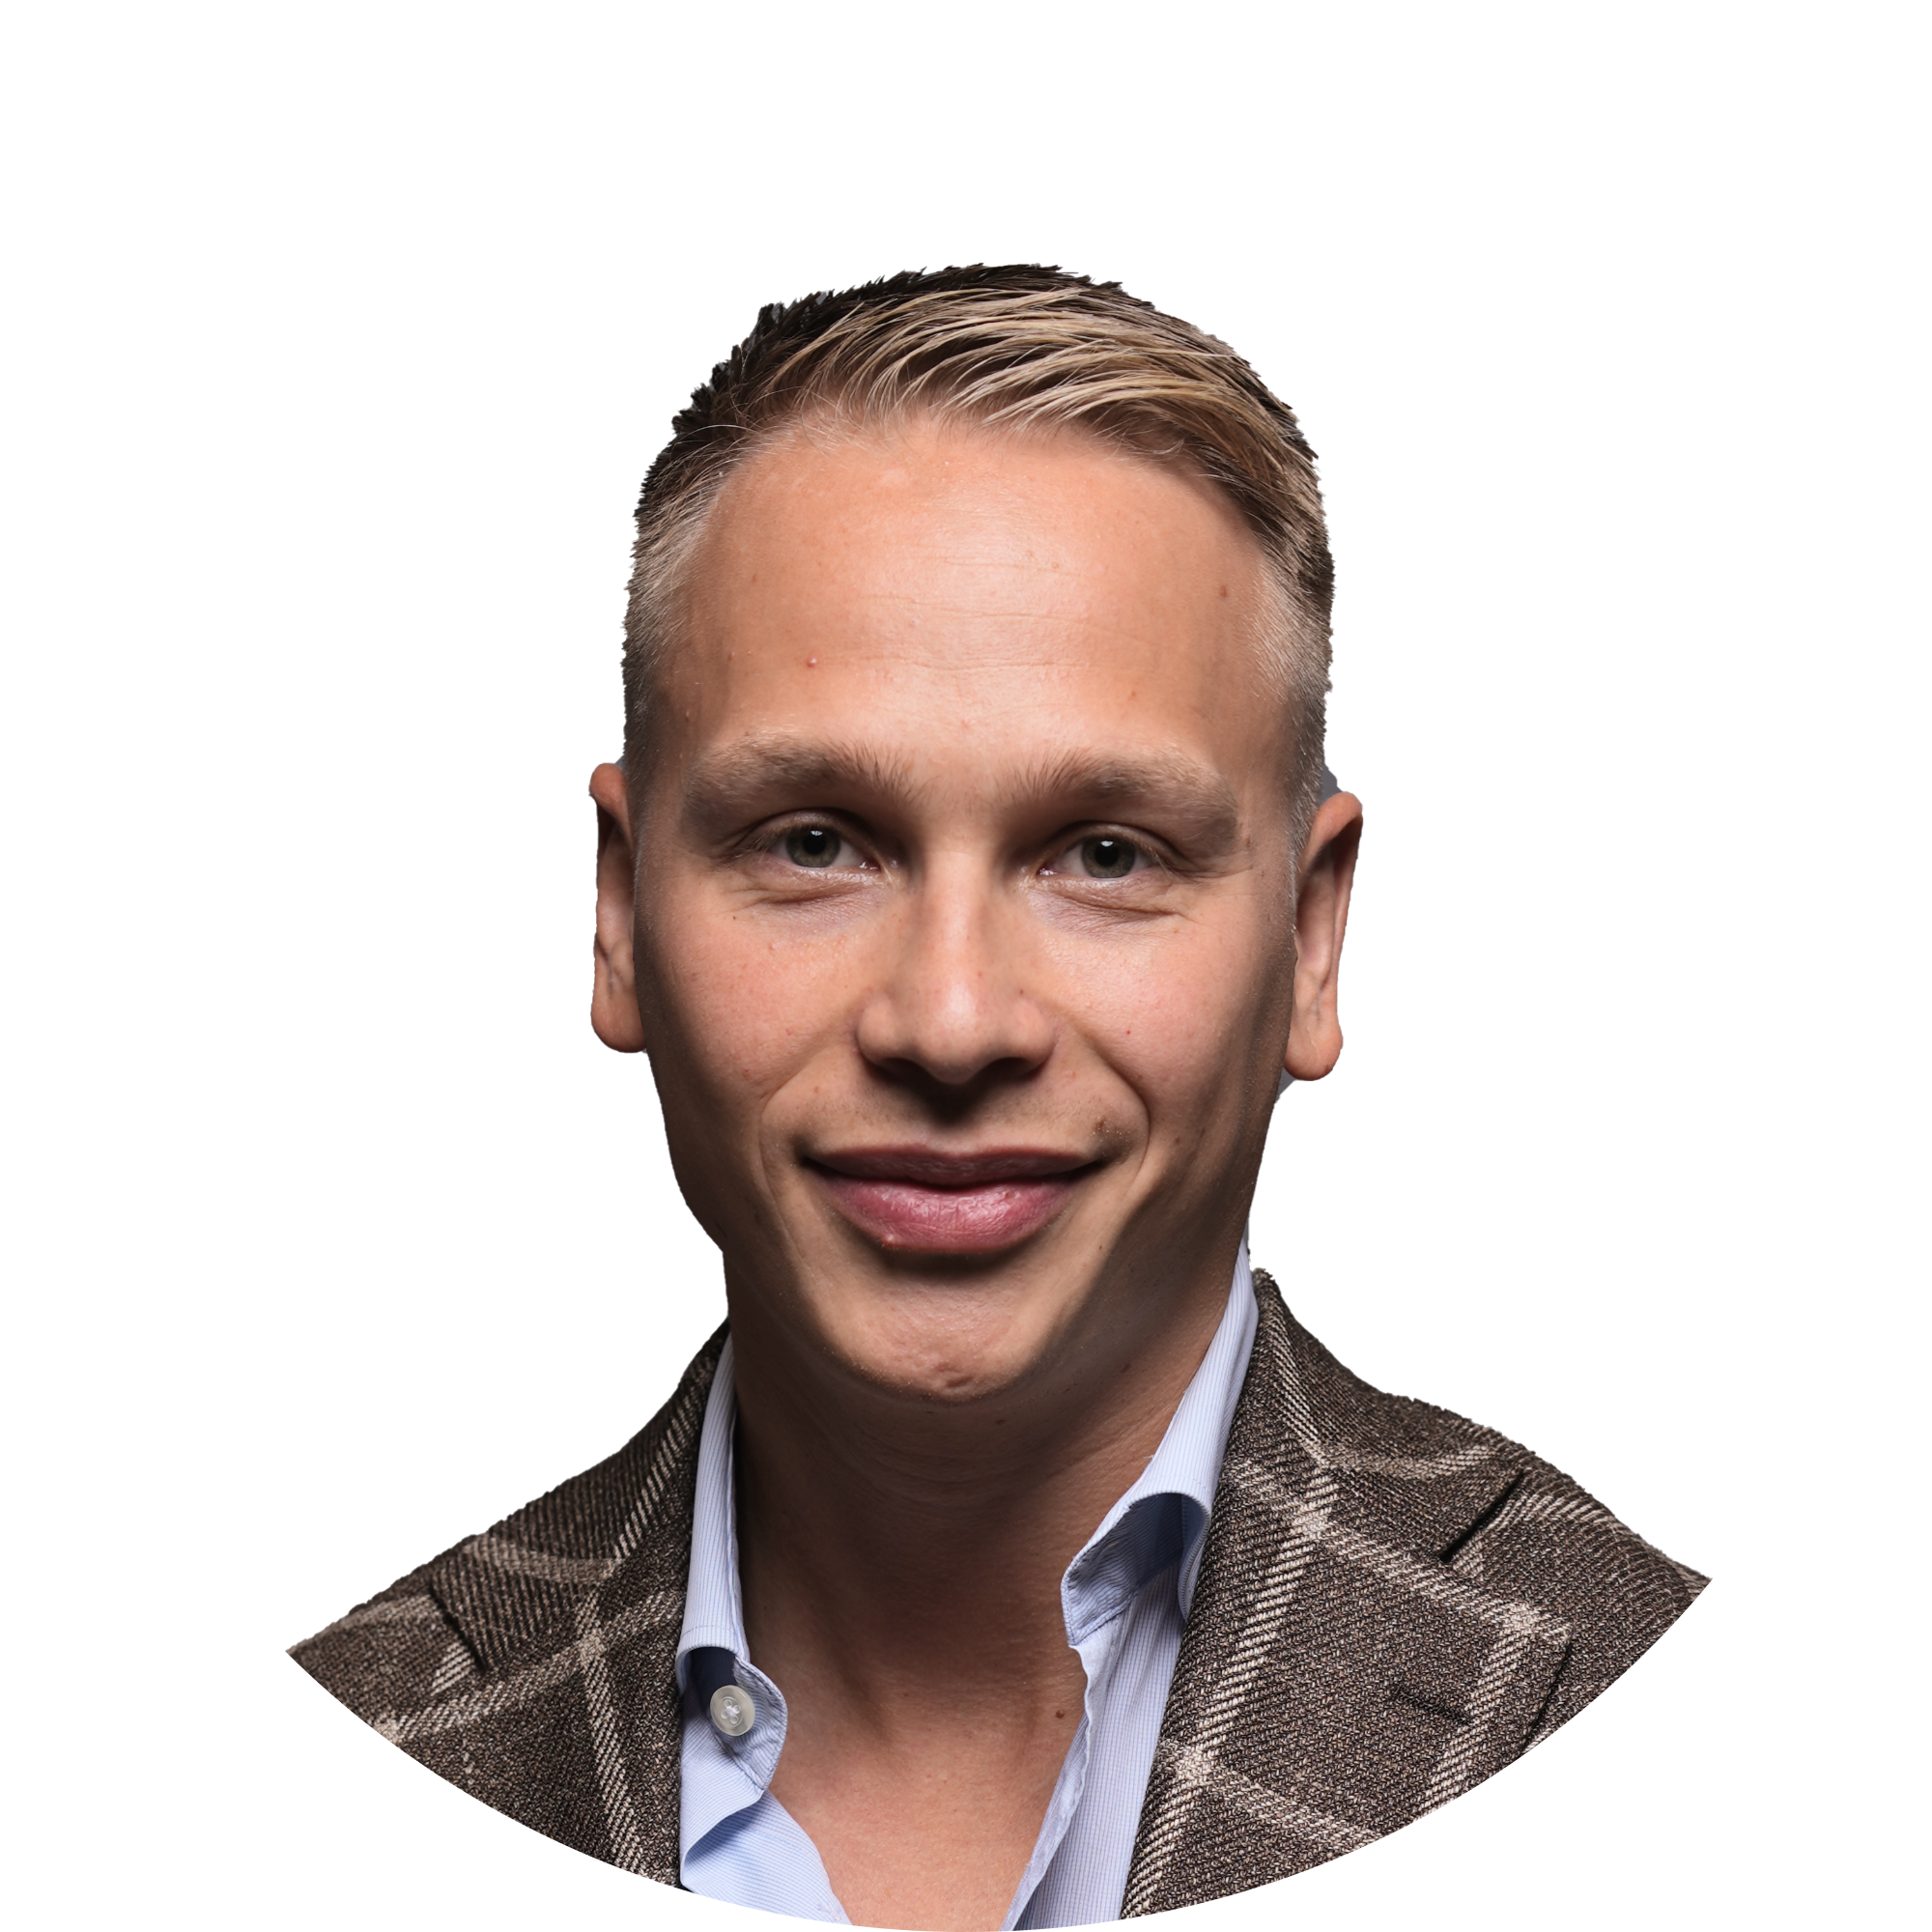 Robin Lindqvist